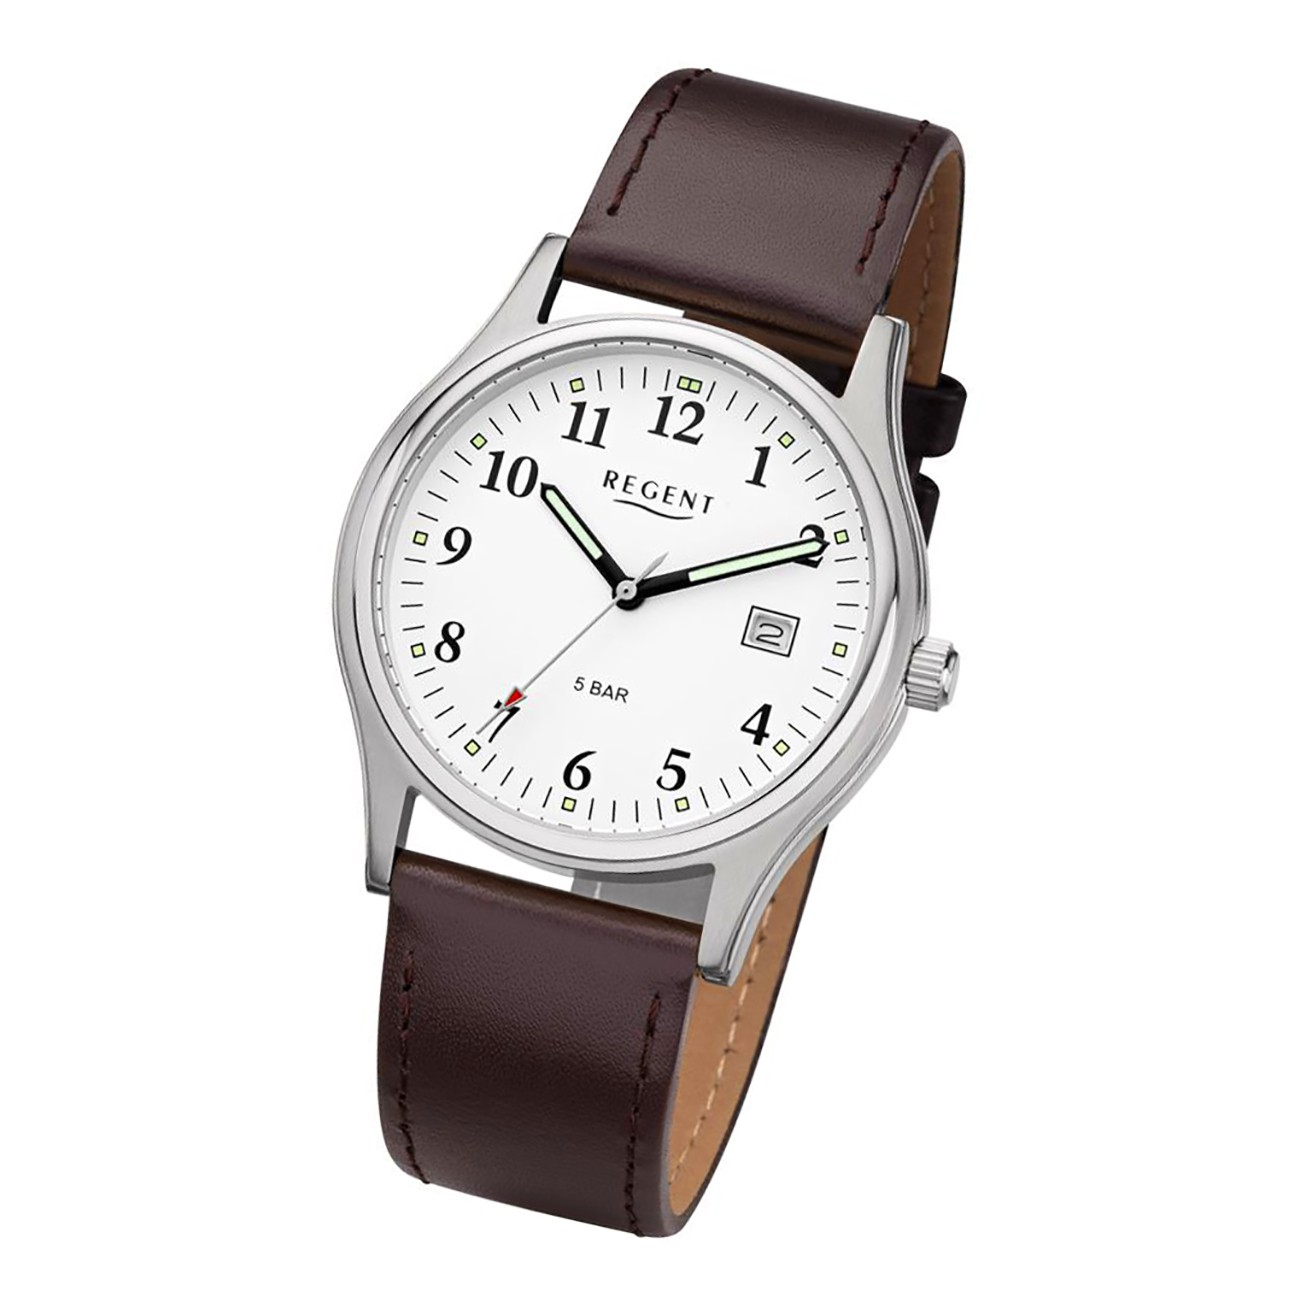 Regent Herren-Armbanduhr Mineralglas Quarz Leder braun URF955